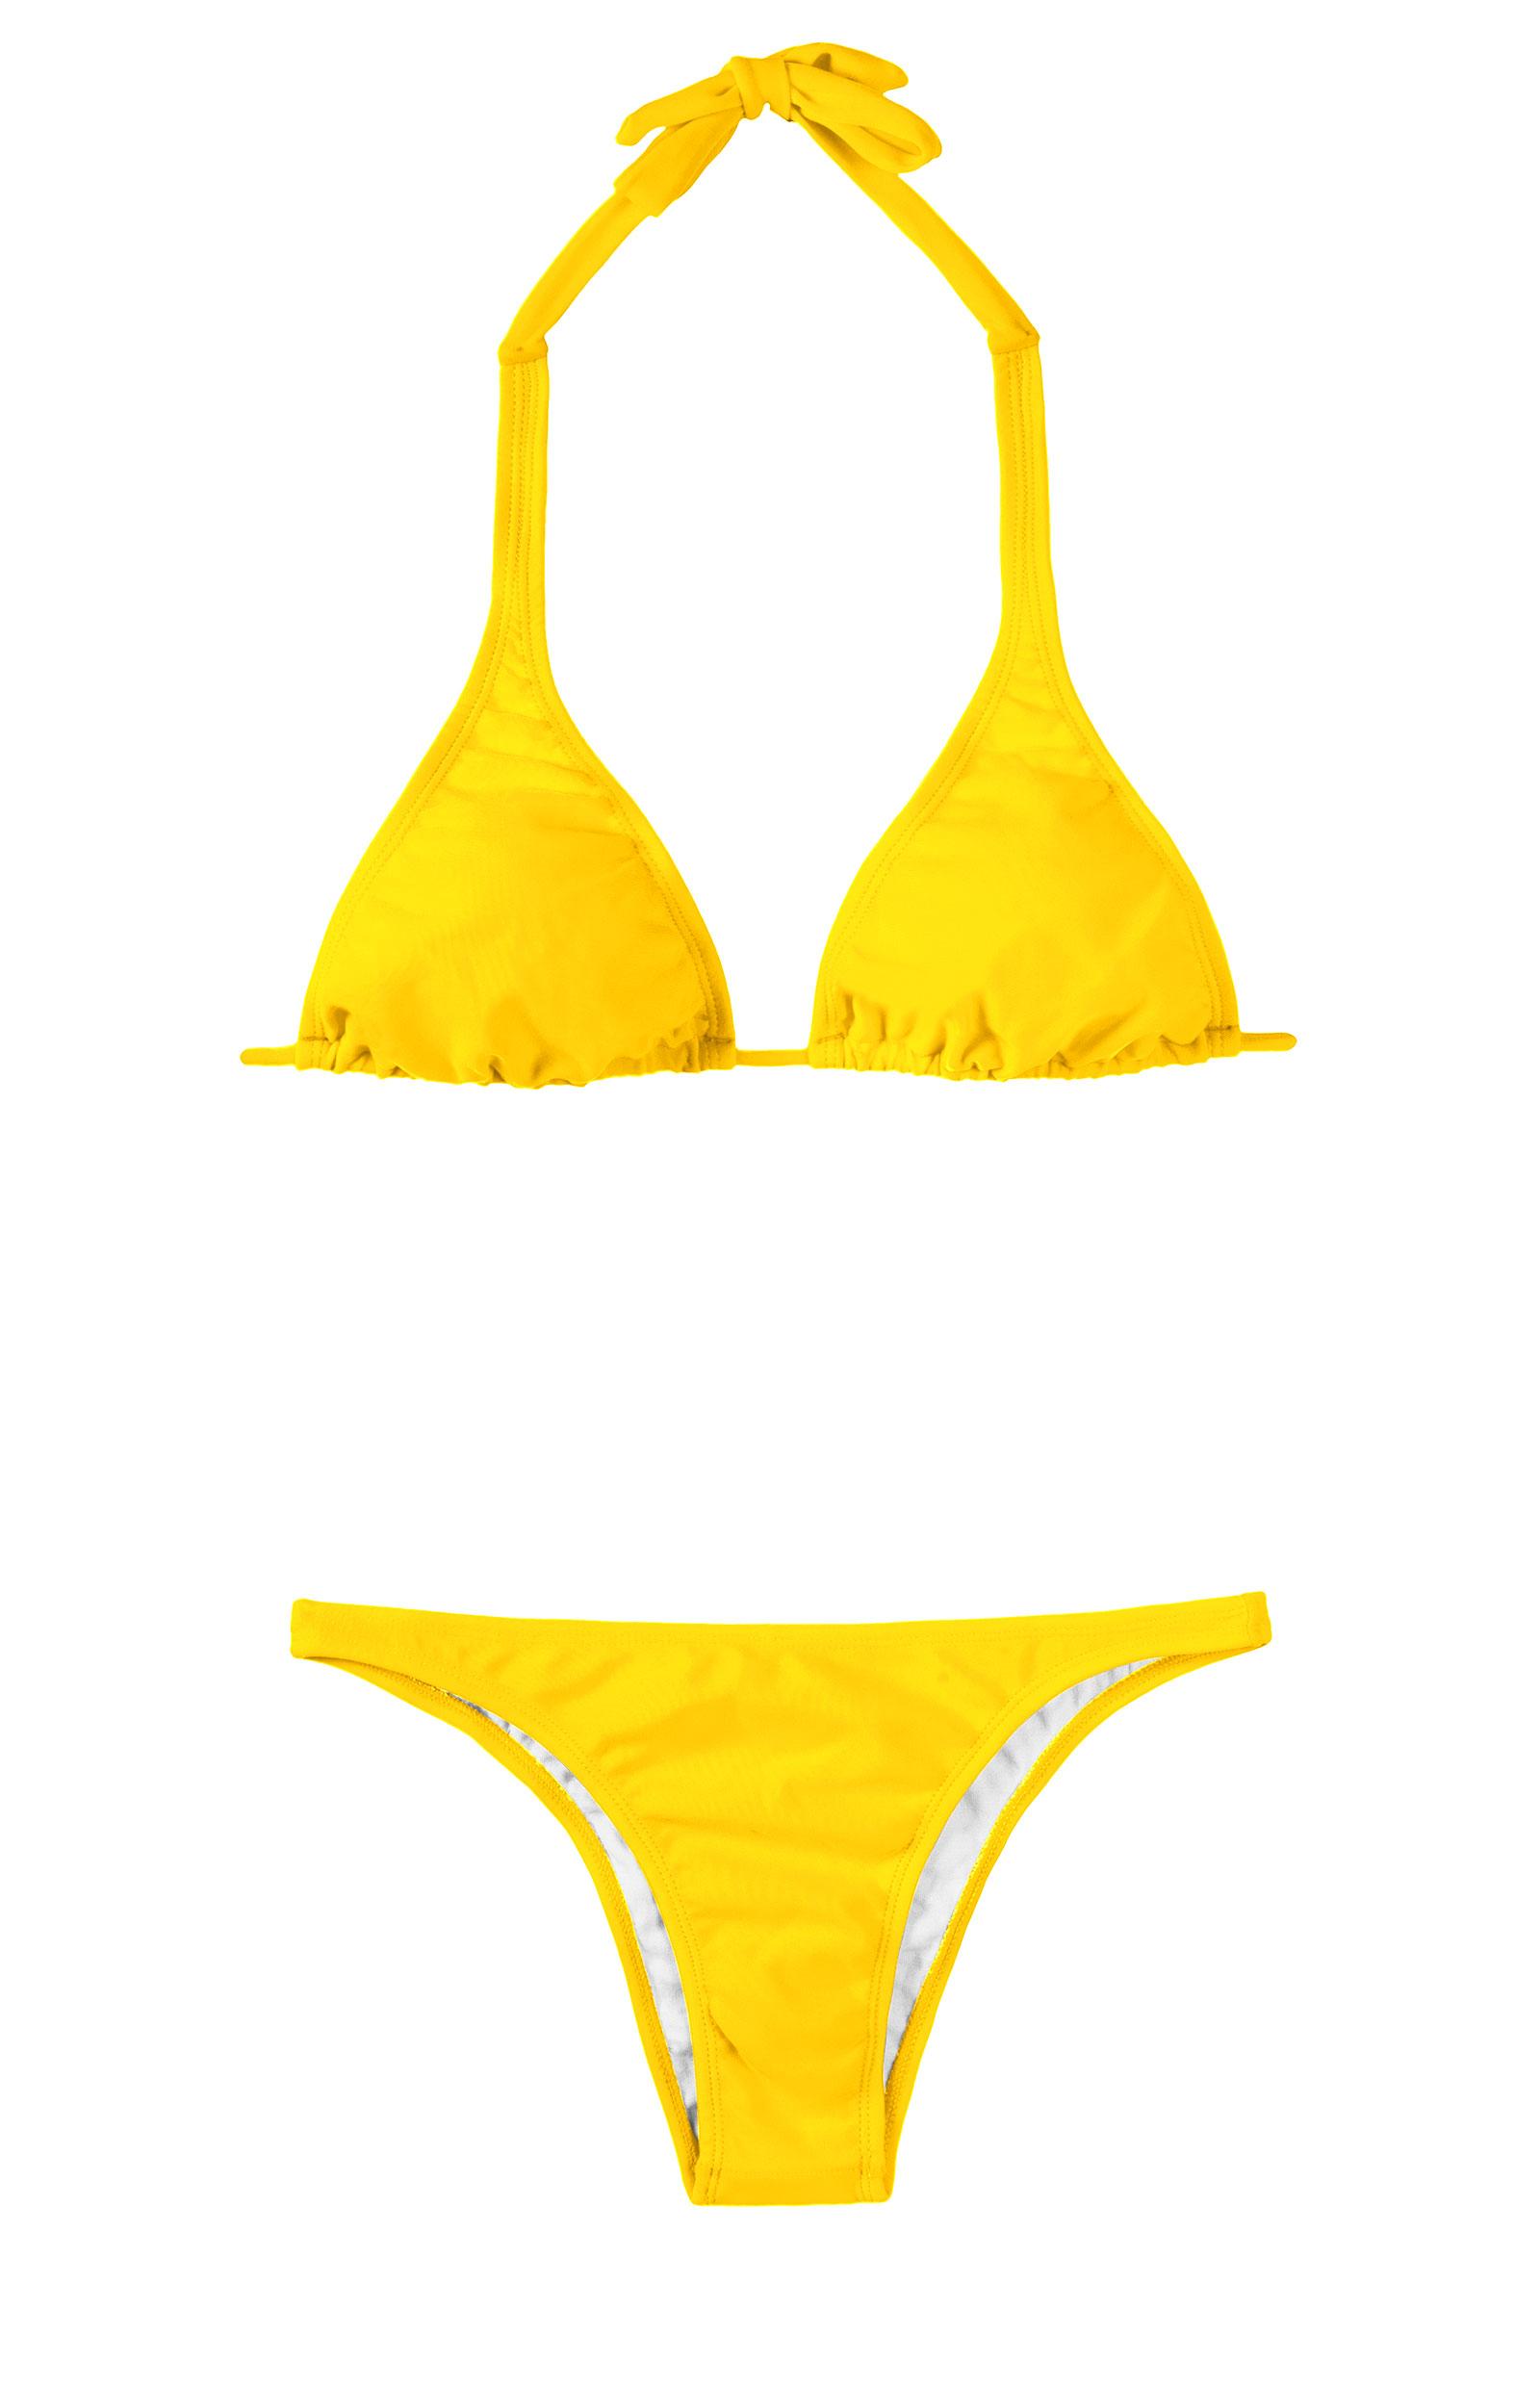 maillot de bain 2 pi ces triangle jaune ipe cortinao basic. Black Bedroom Furniture Sets. Home Design Ideas